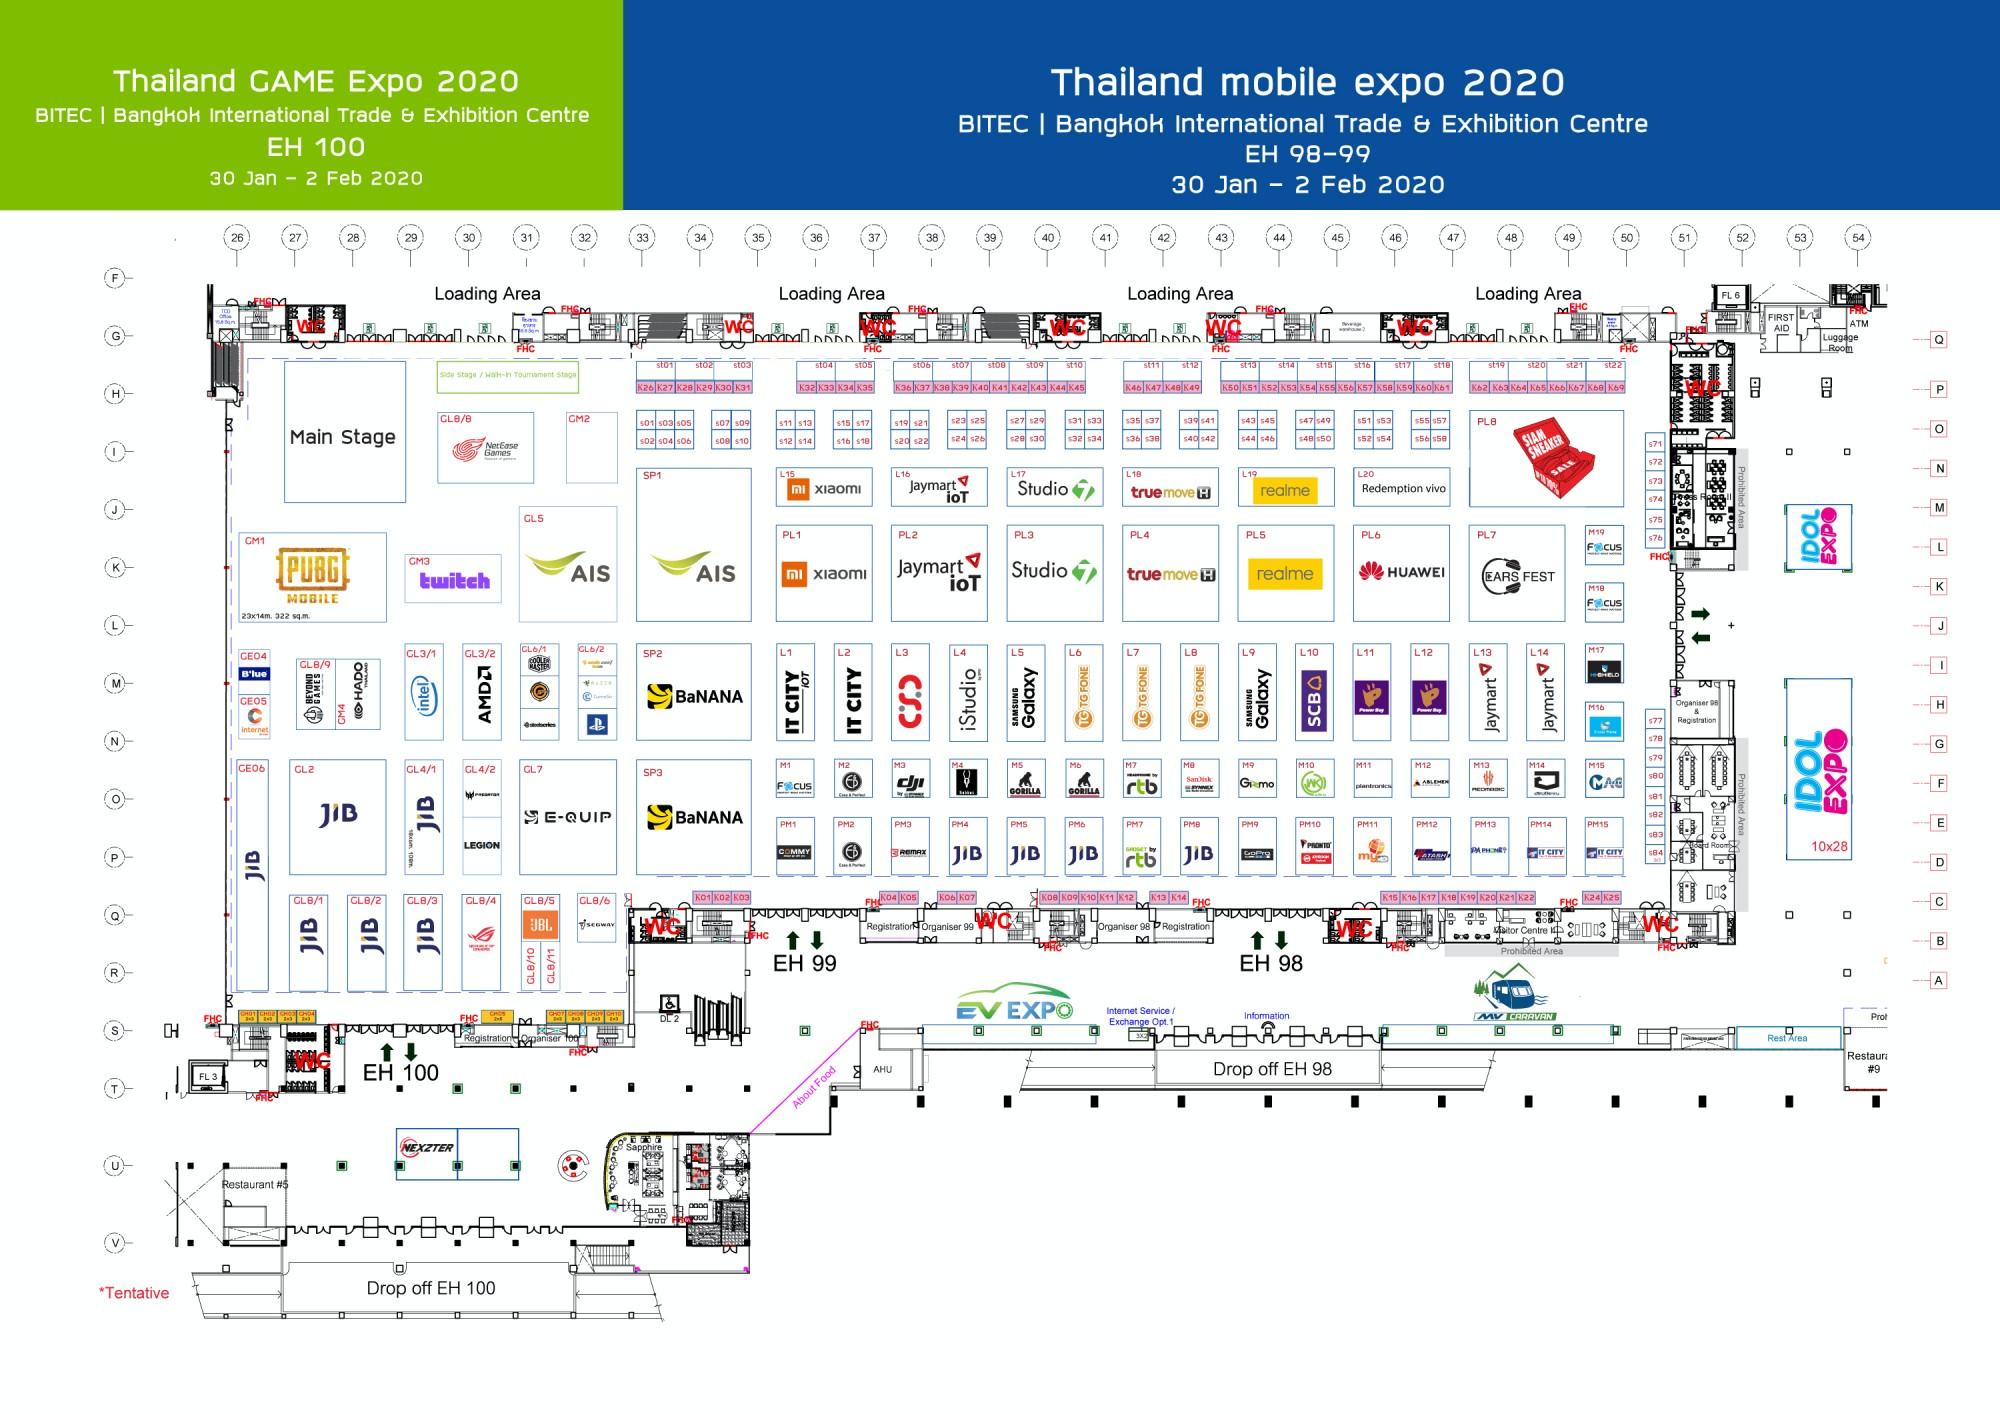 Floorplan Thailand Mobile Expo 2020 jan 30 - feb 2